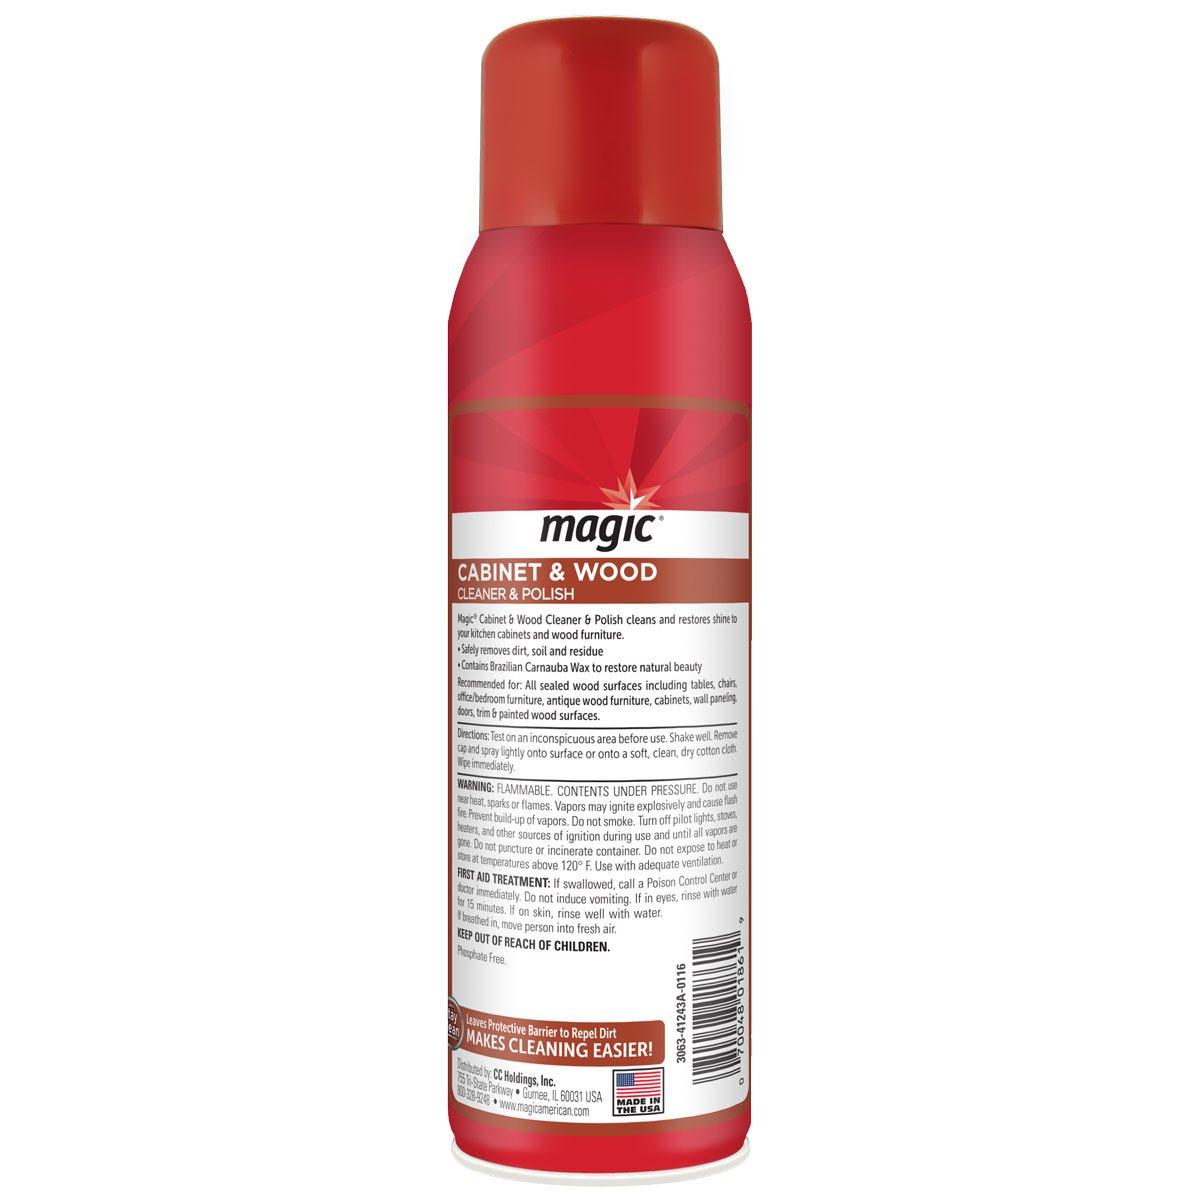 https://googone.com/media/catalog/product/c/a/cabinet-cleaner-_-polish-aerosol_back.jpg